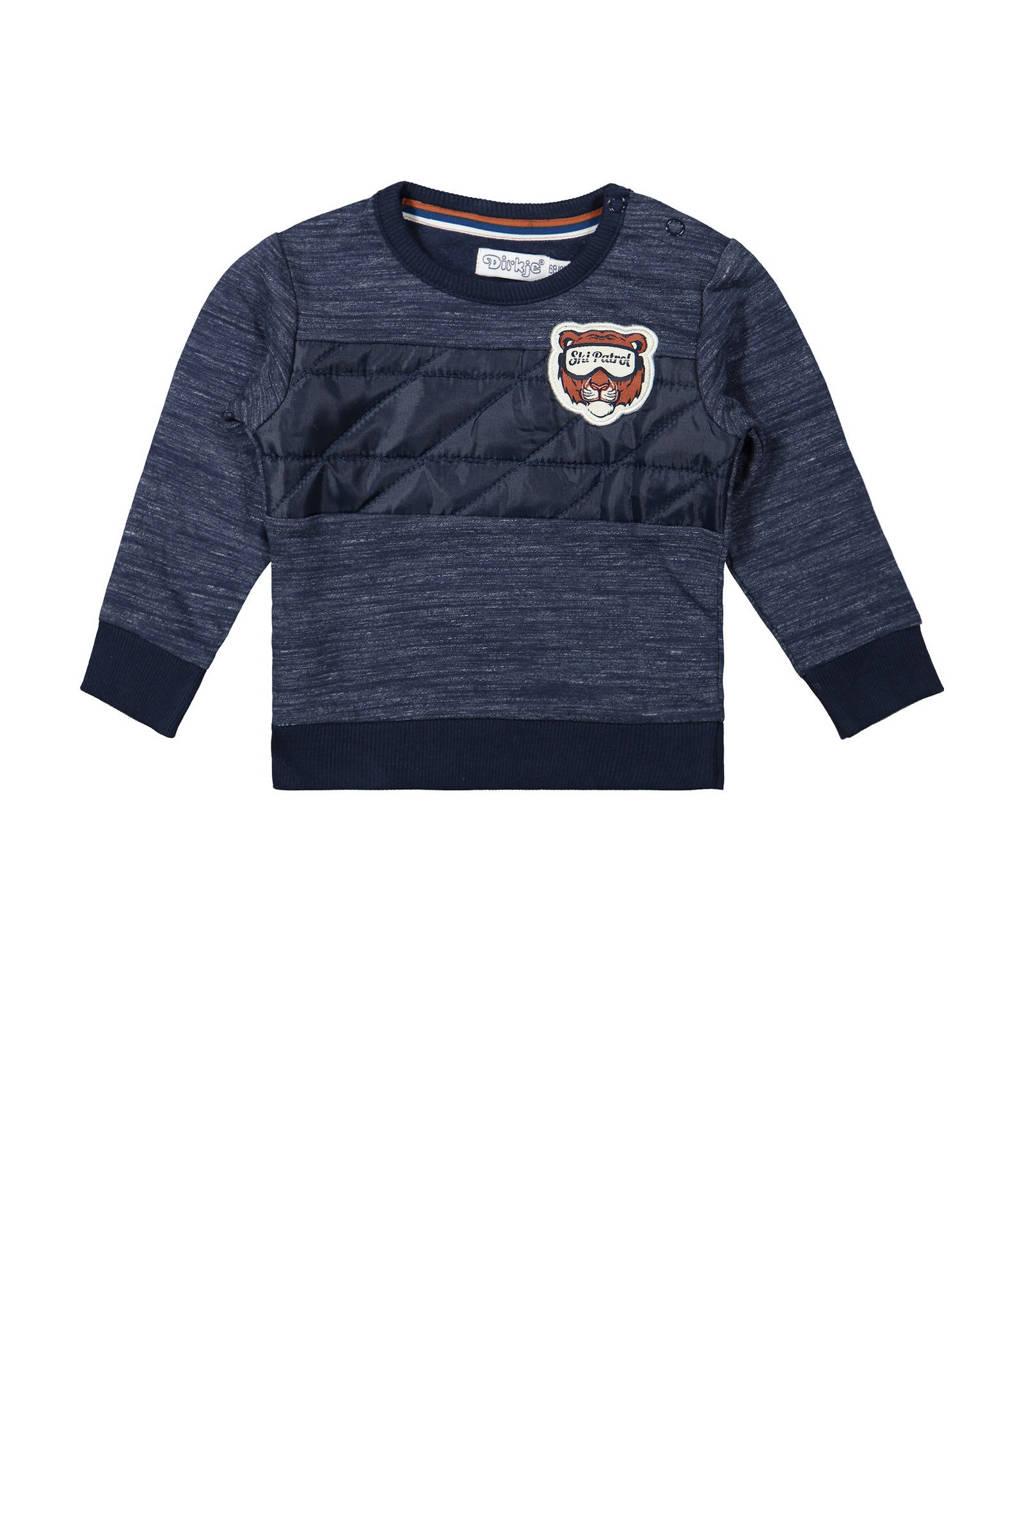 Dirkje gemêleerde sweater donkerblauw melange, Donkerblauw melange